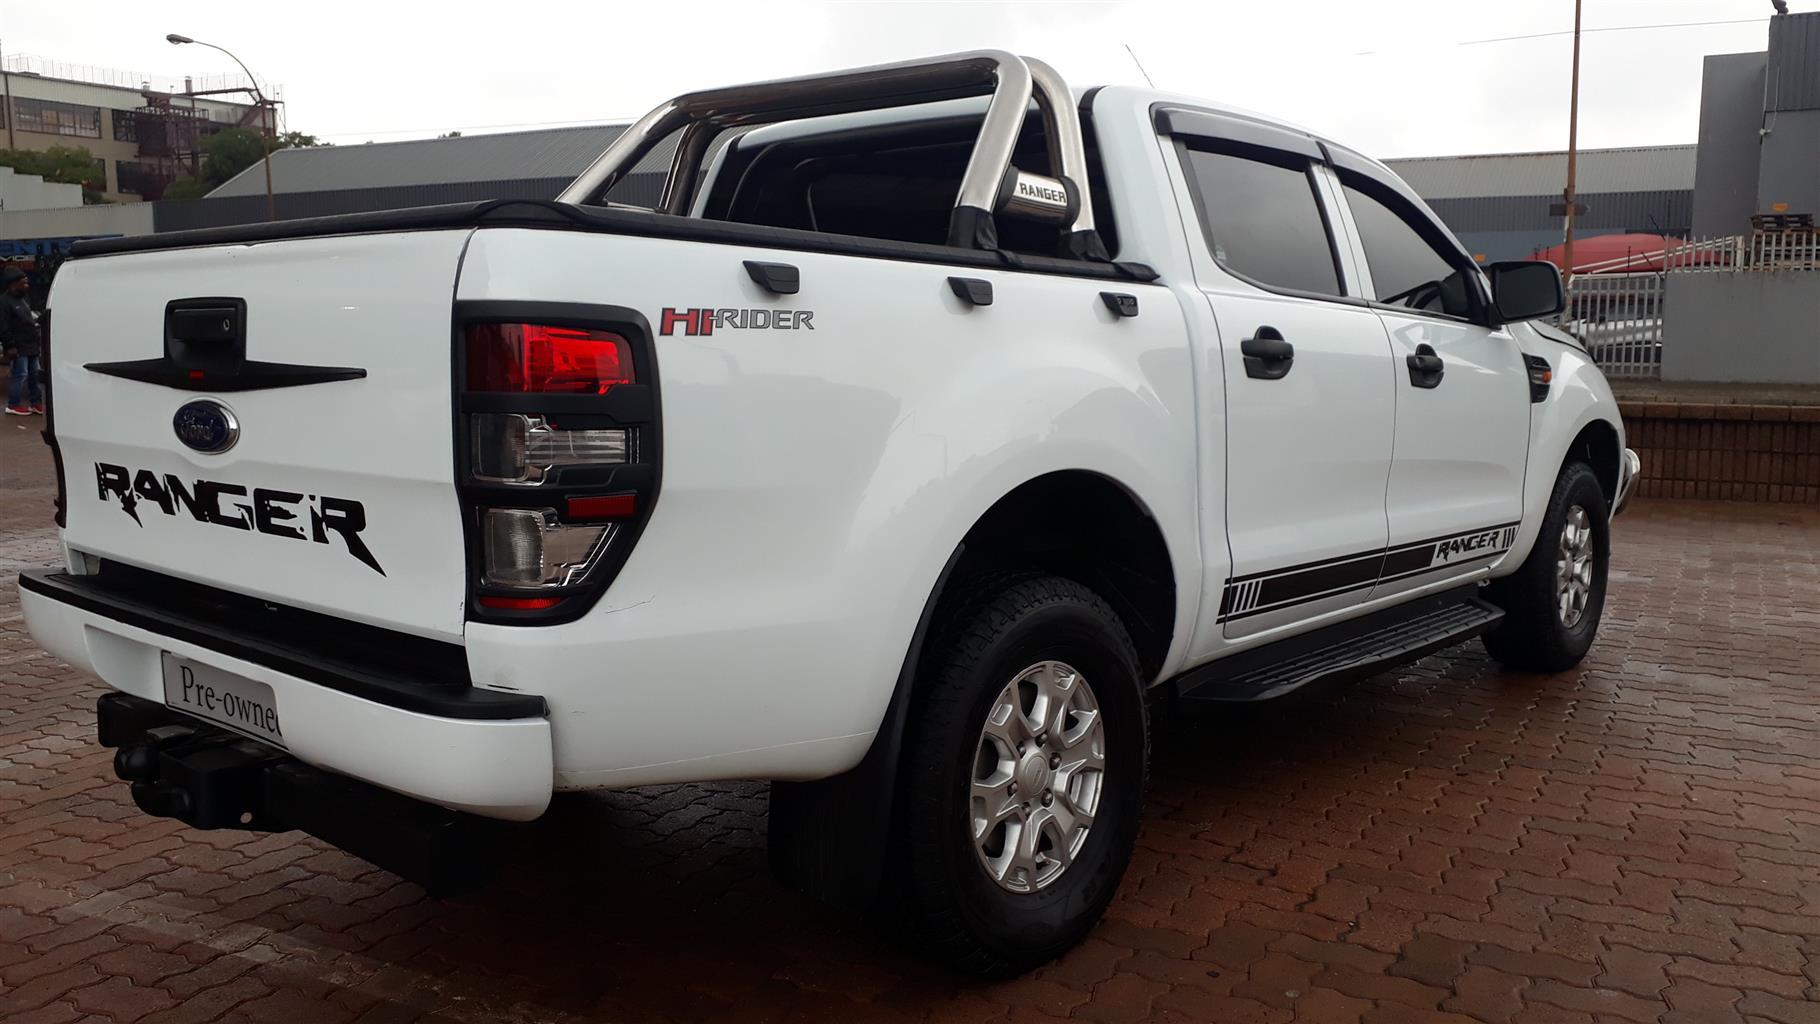 2017 Ford Ranger 2.2 double cab Hi Rider